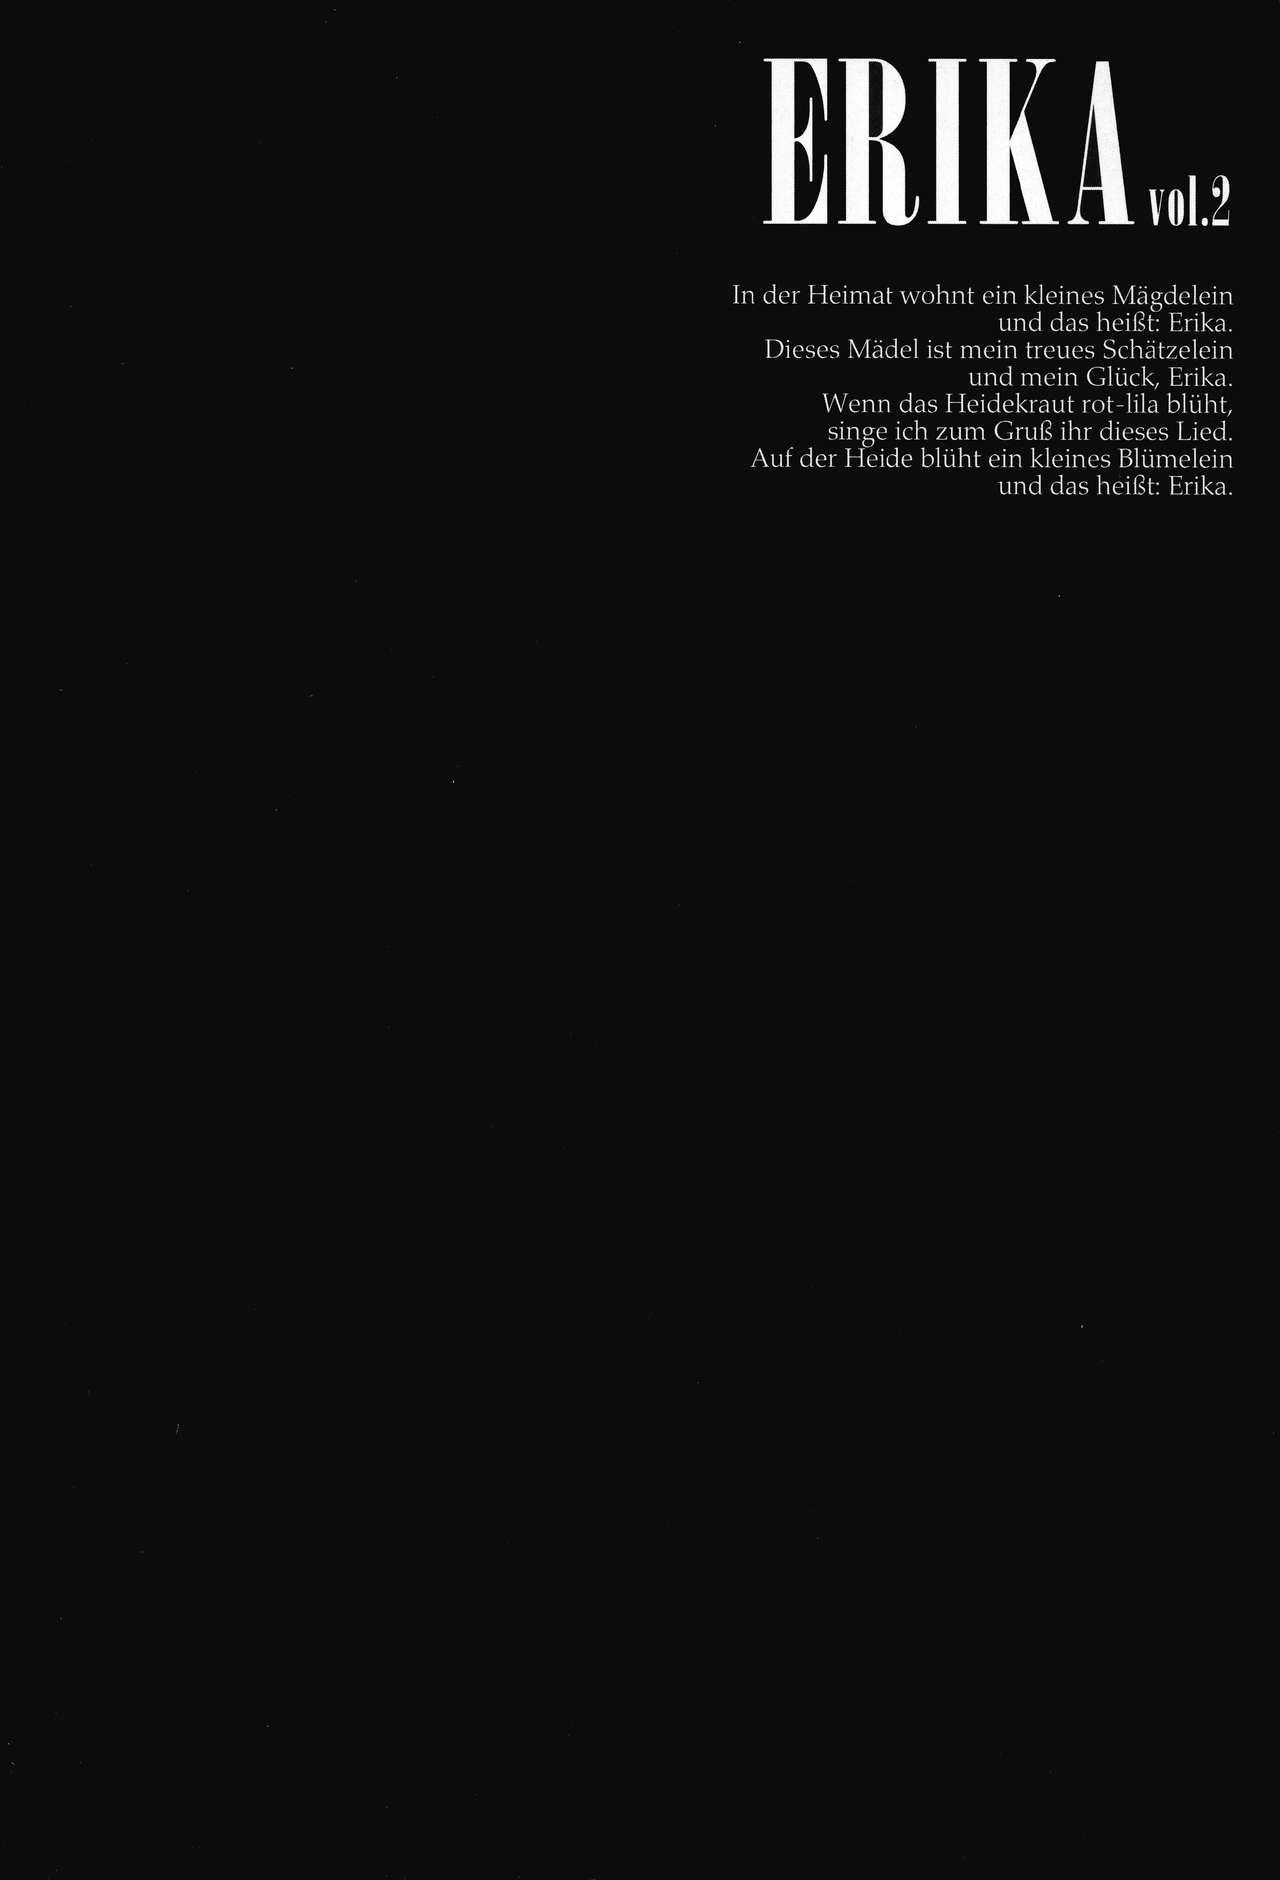 ERIKA Vol. 2 2